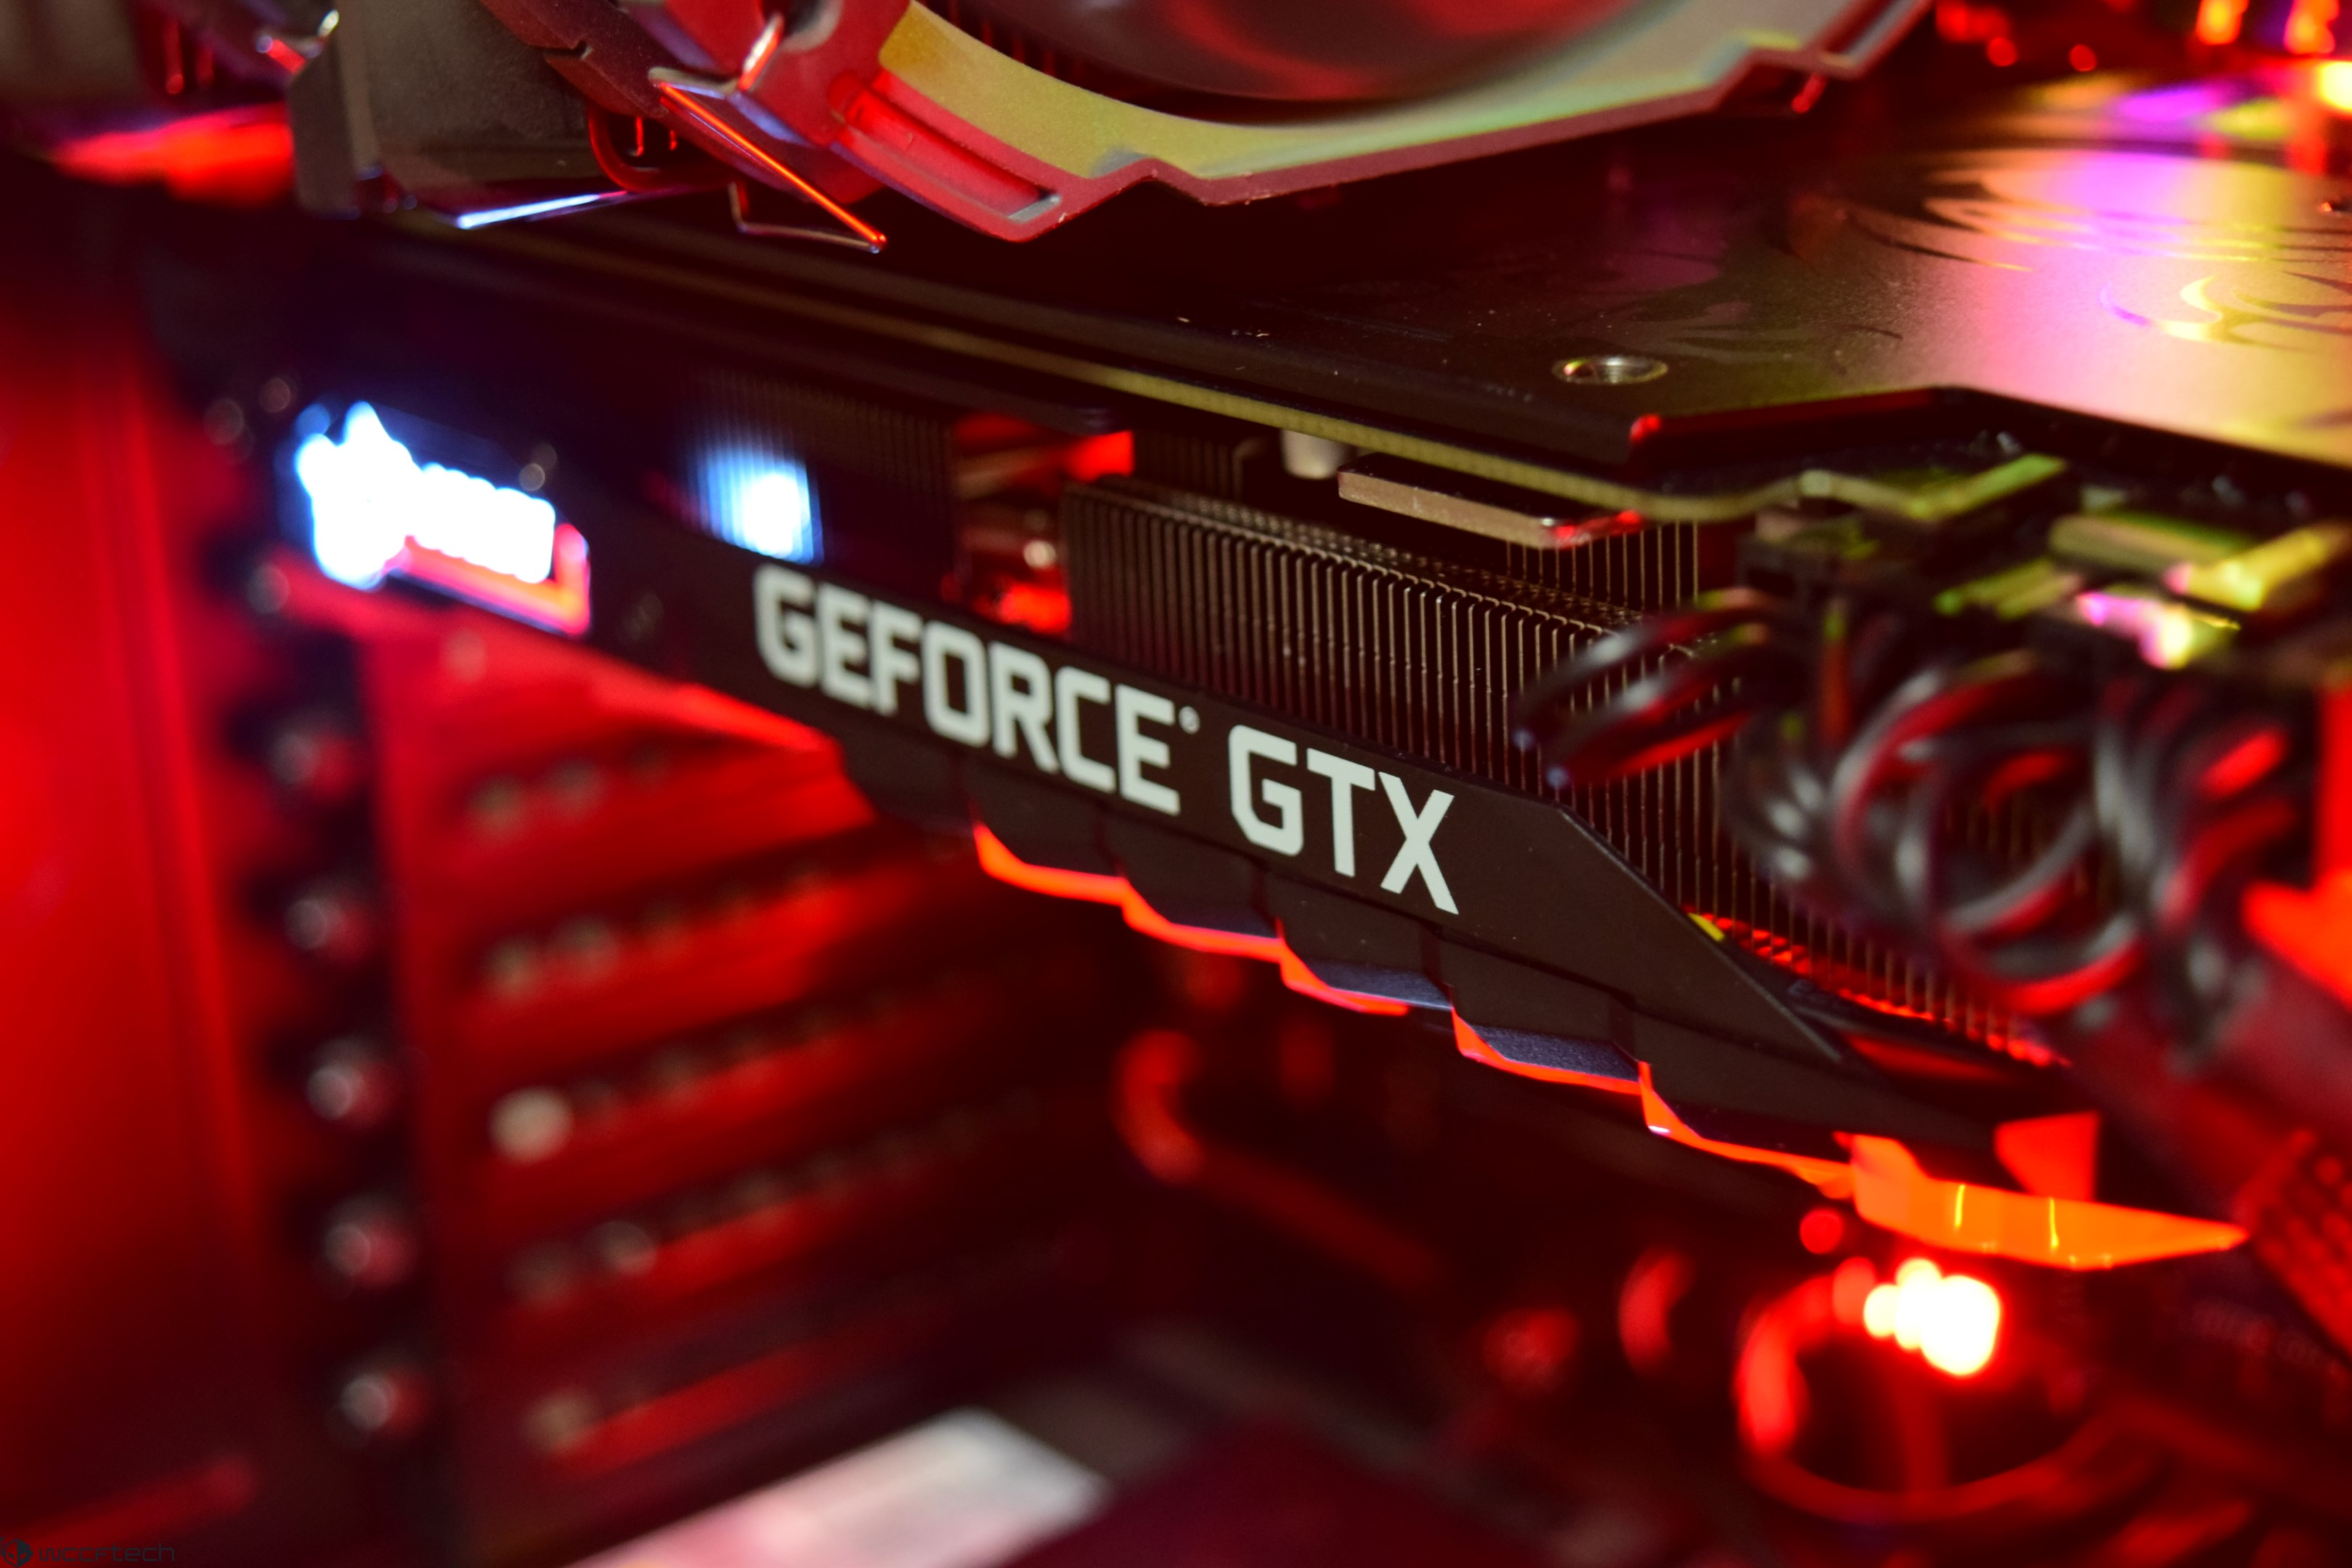 Msi Geforce Gtx 1080 Ti Lightning X Graphics Card Review